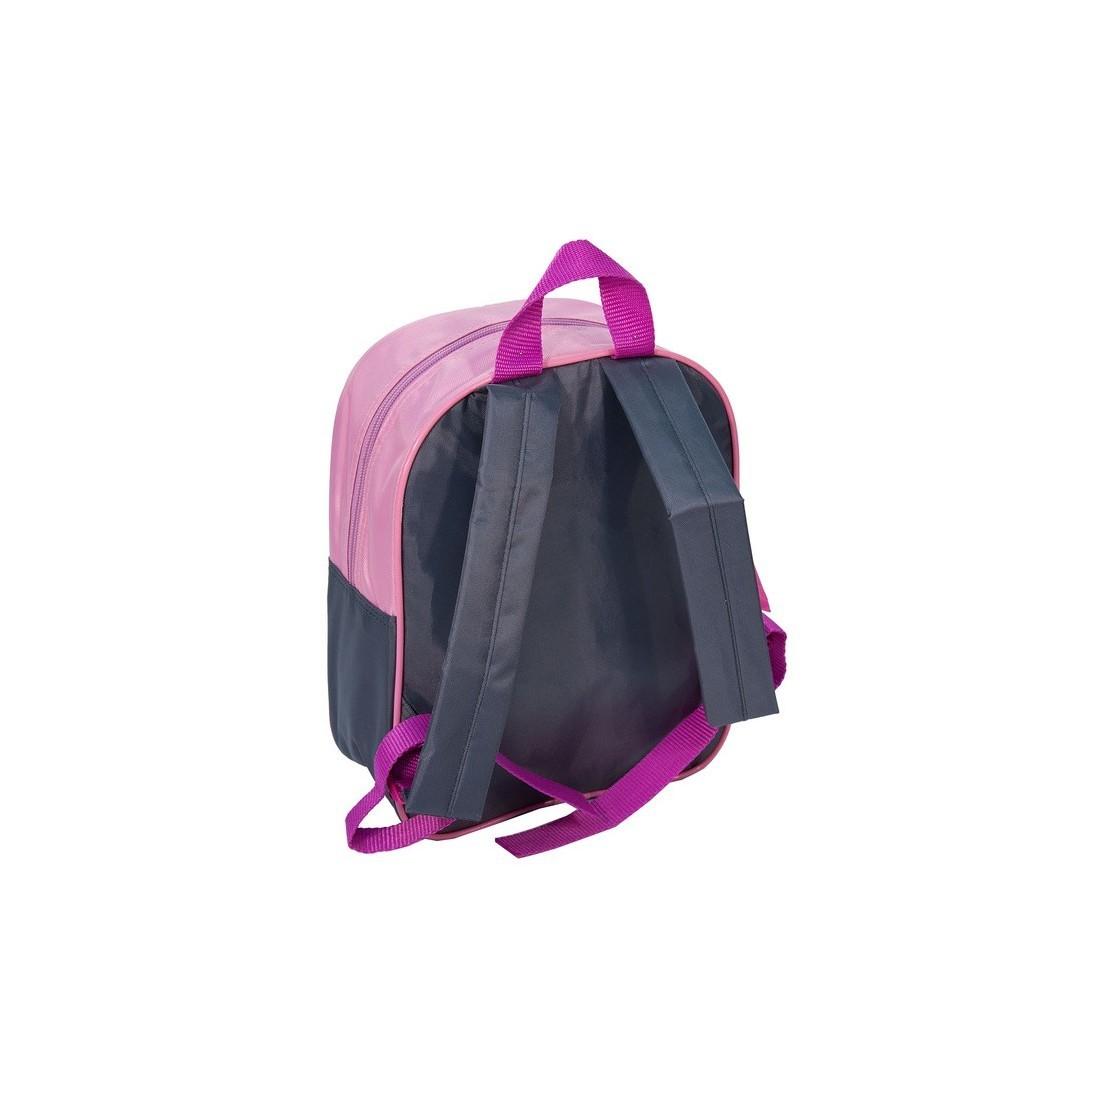 Plecaczek Rachael Hale z dwoma pieskami - plecak-tornister.pl